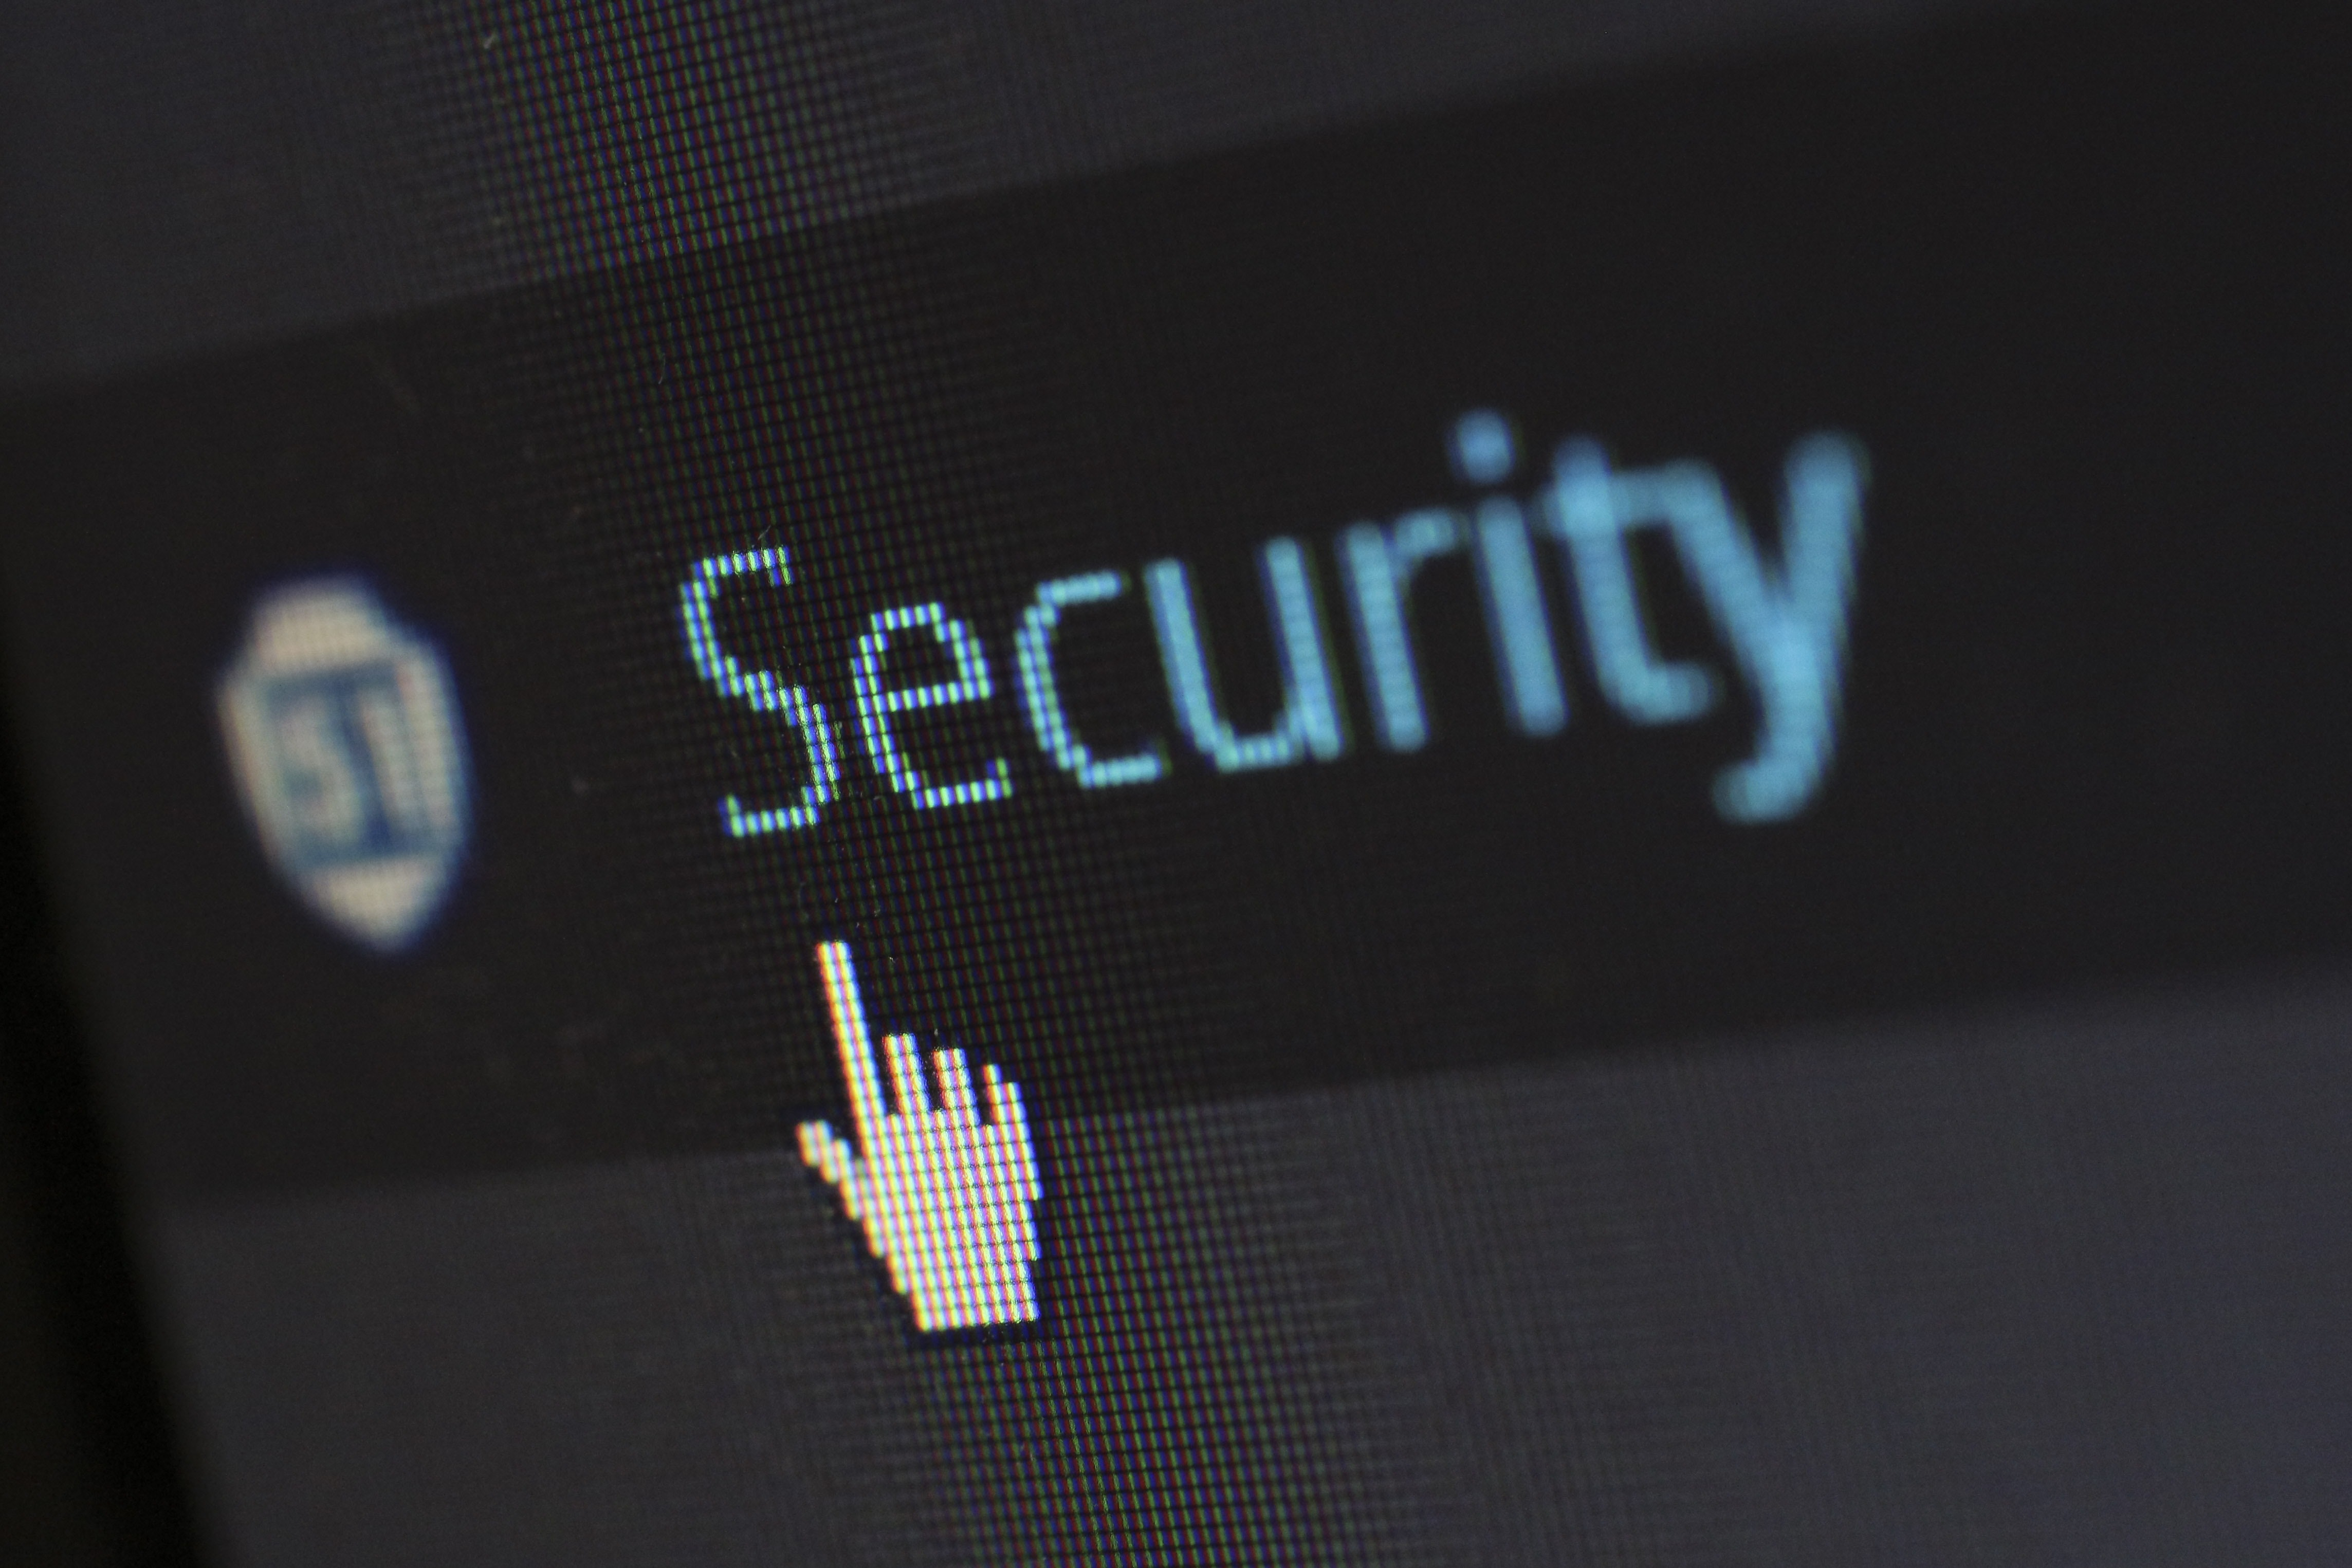 sicurezza password banche online.jpg